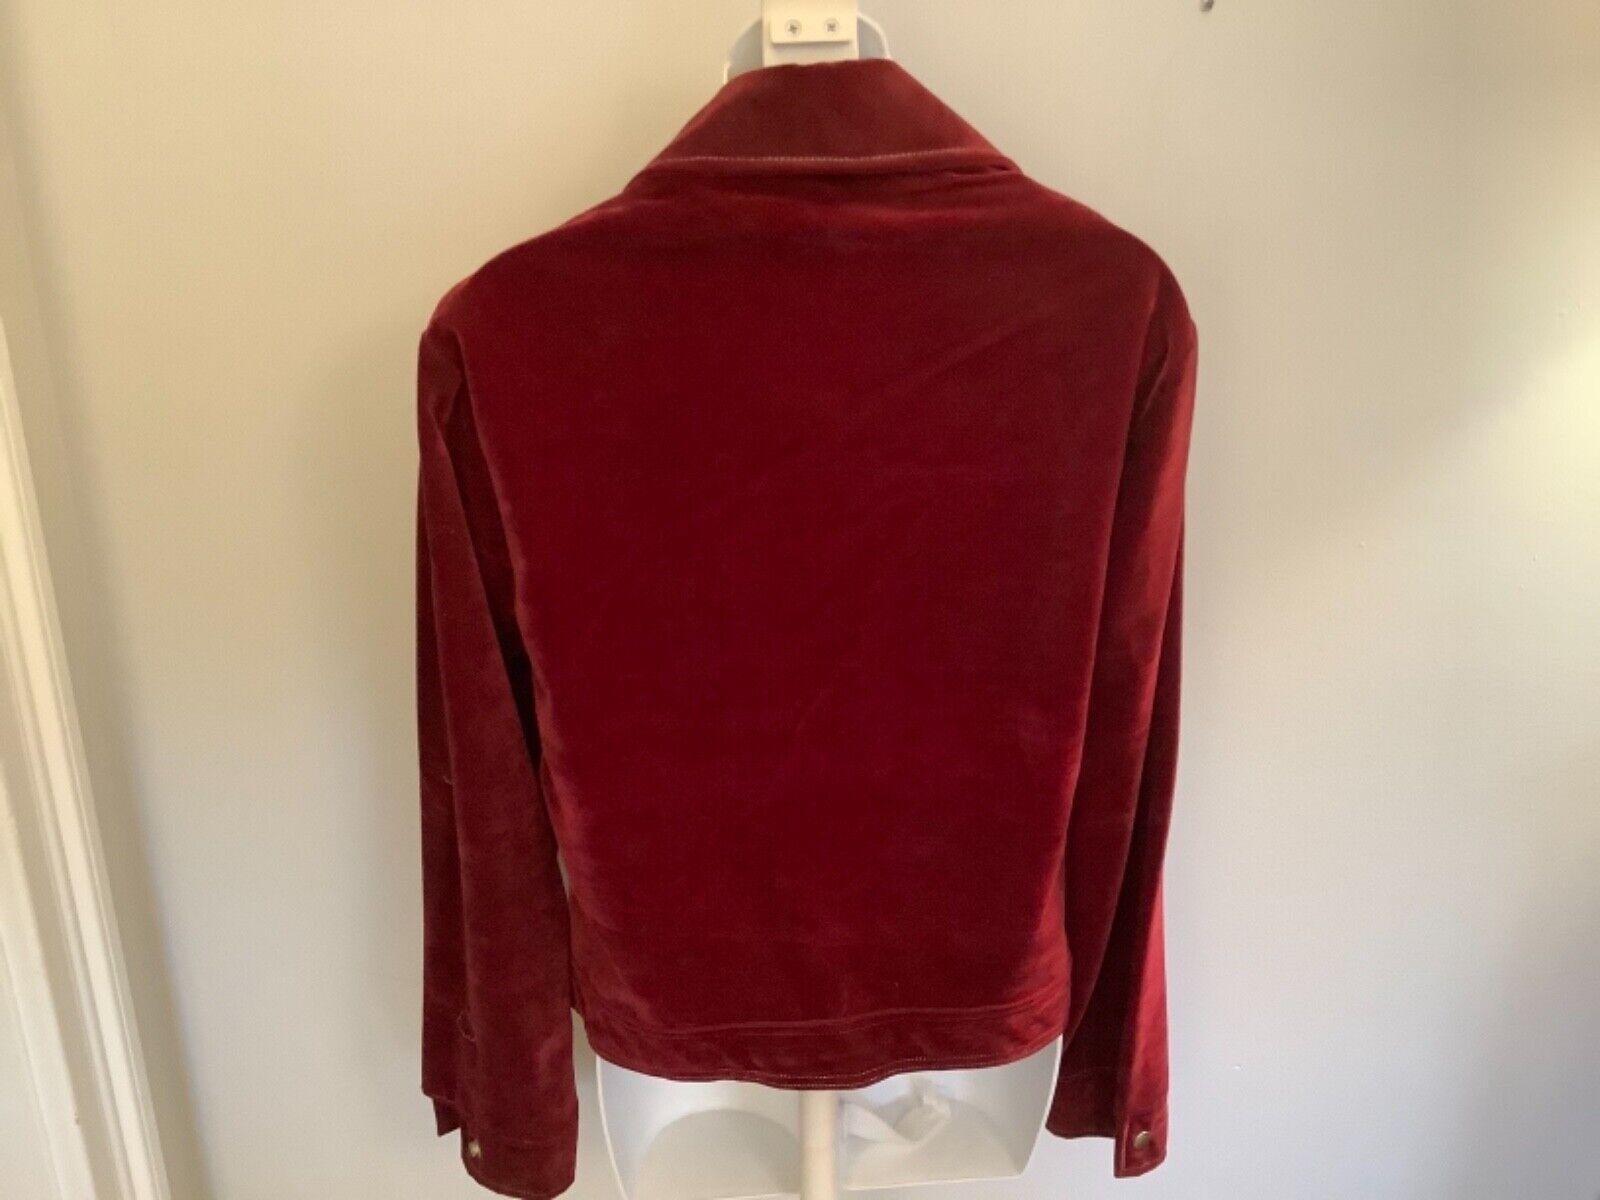 VINTAGE Women's Burgundy Red Velvet Blazer Jacket… - image 4